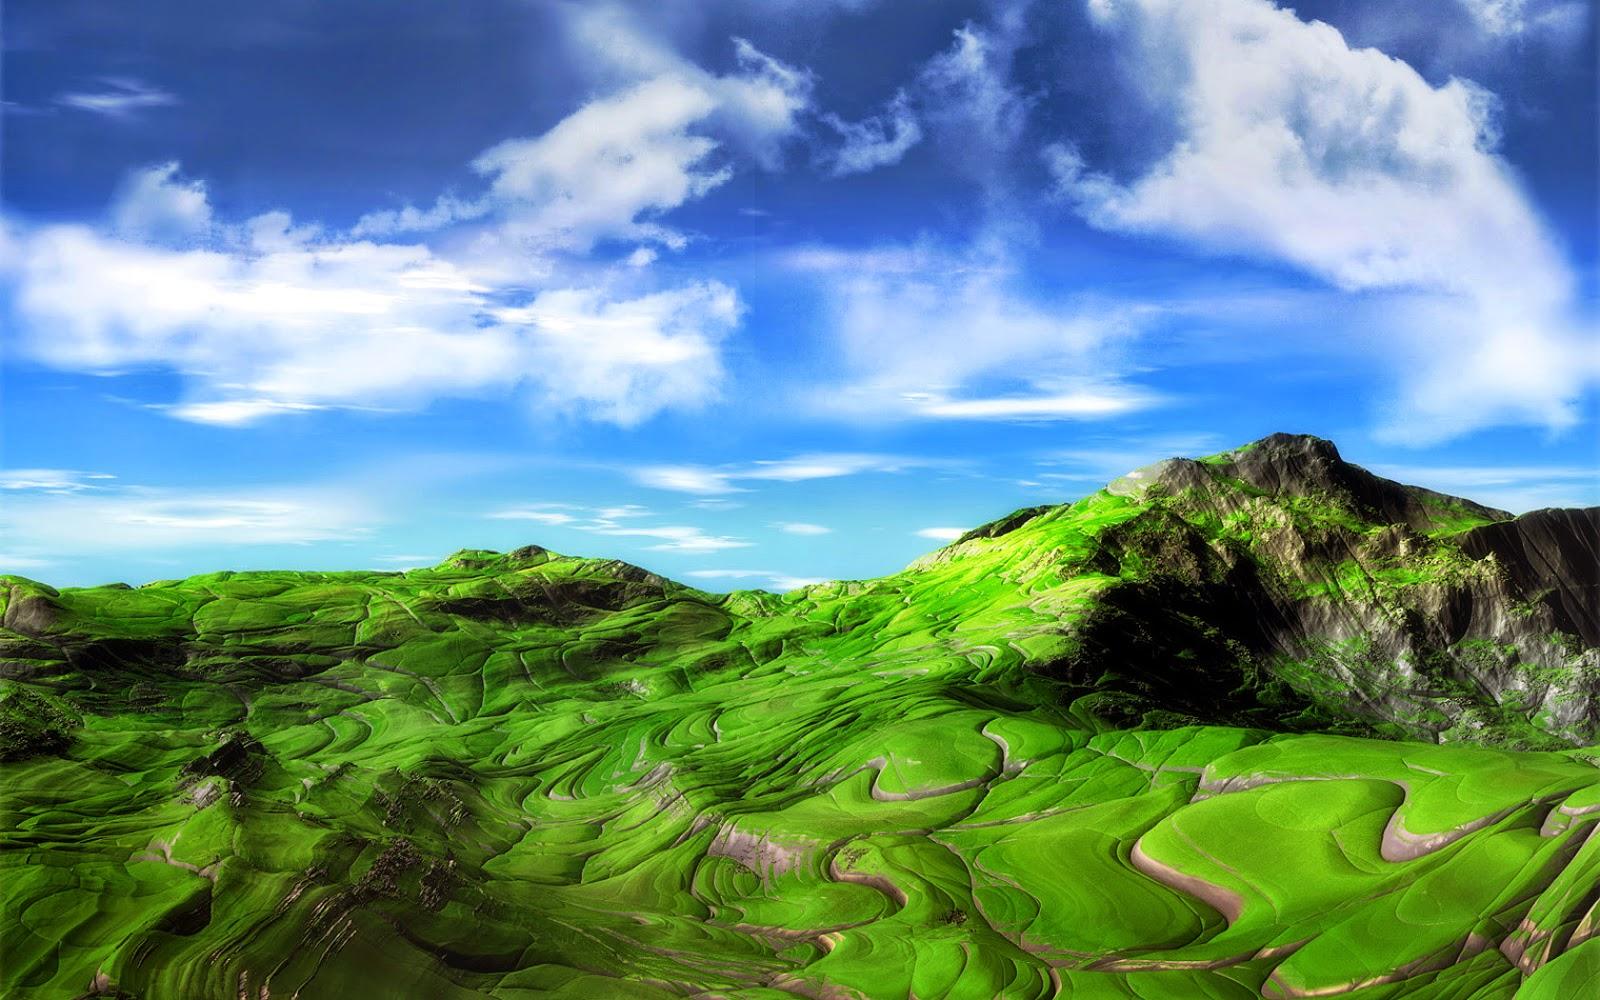 1200x1600 Wallpaper Hd: Greenery 3D Under Sky HD Wallpaper